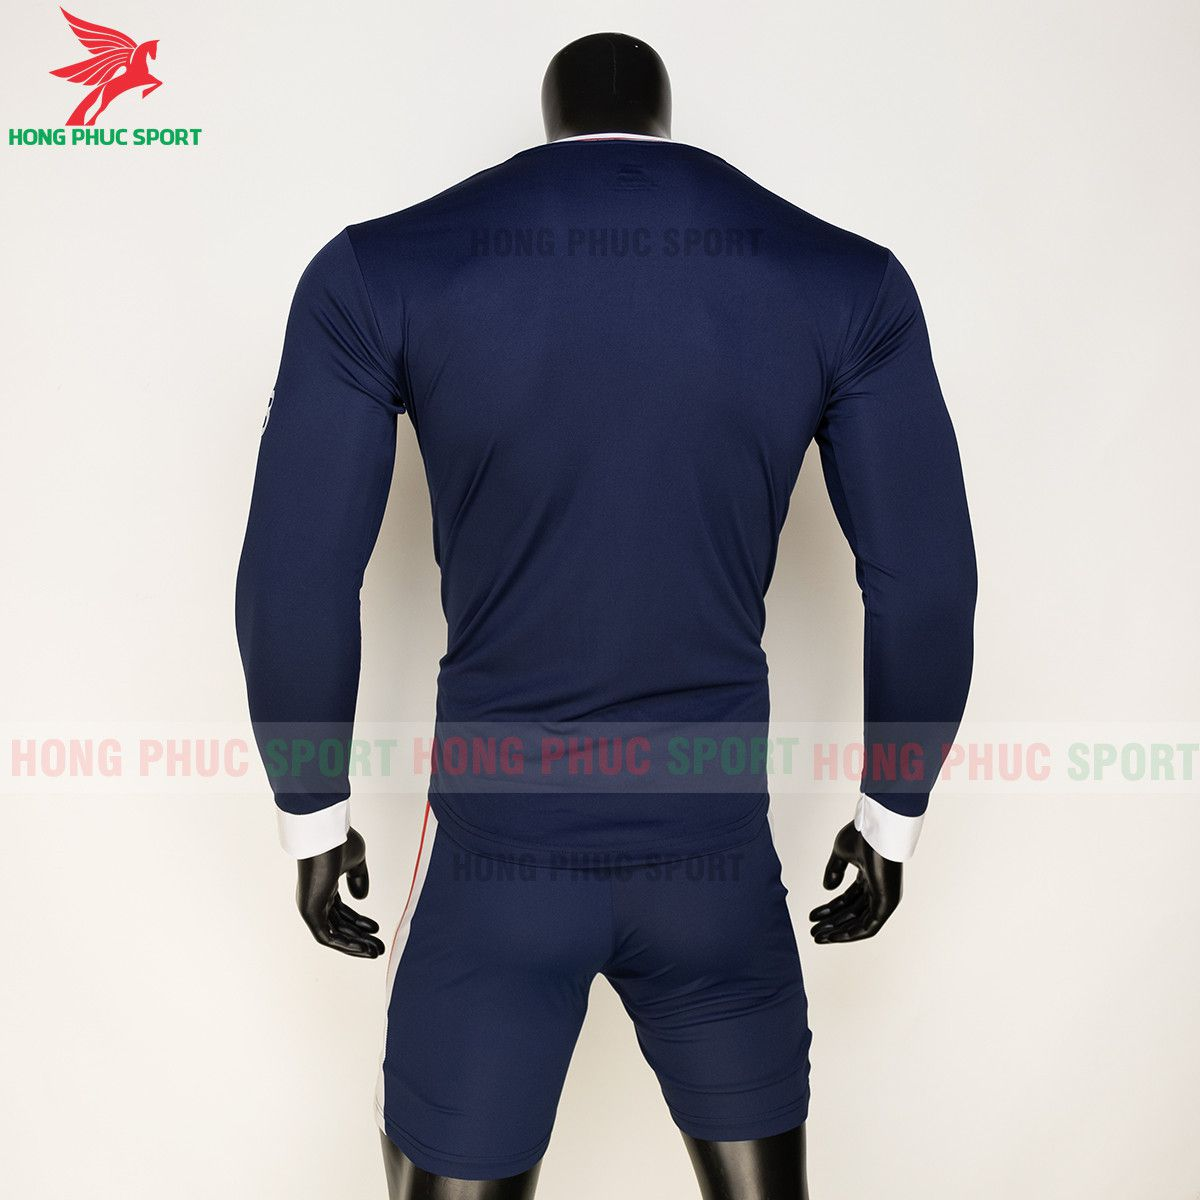 https://cdn.hongphucsport.com/unsafe/s4.shopbay.vn/files/285/ao-bong-da-dai-tay-psg-2021-22-san-nha-thun-lanh-615d58868fe37.jpg